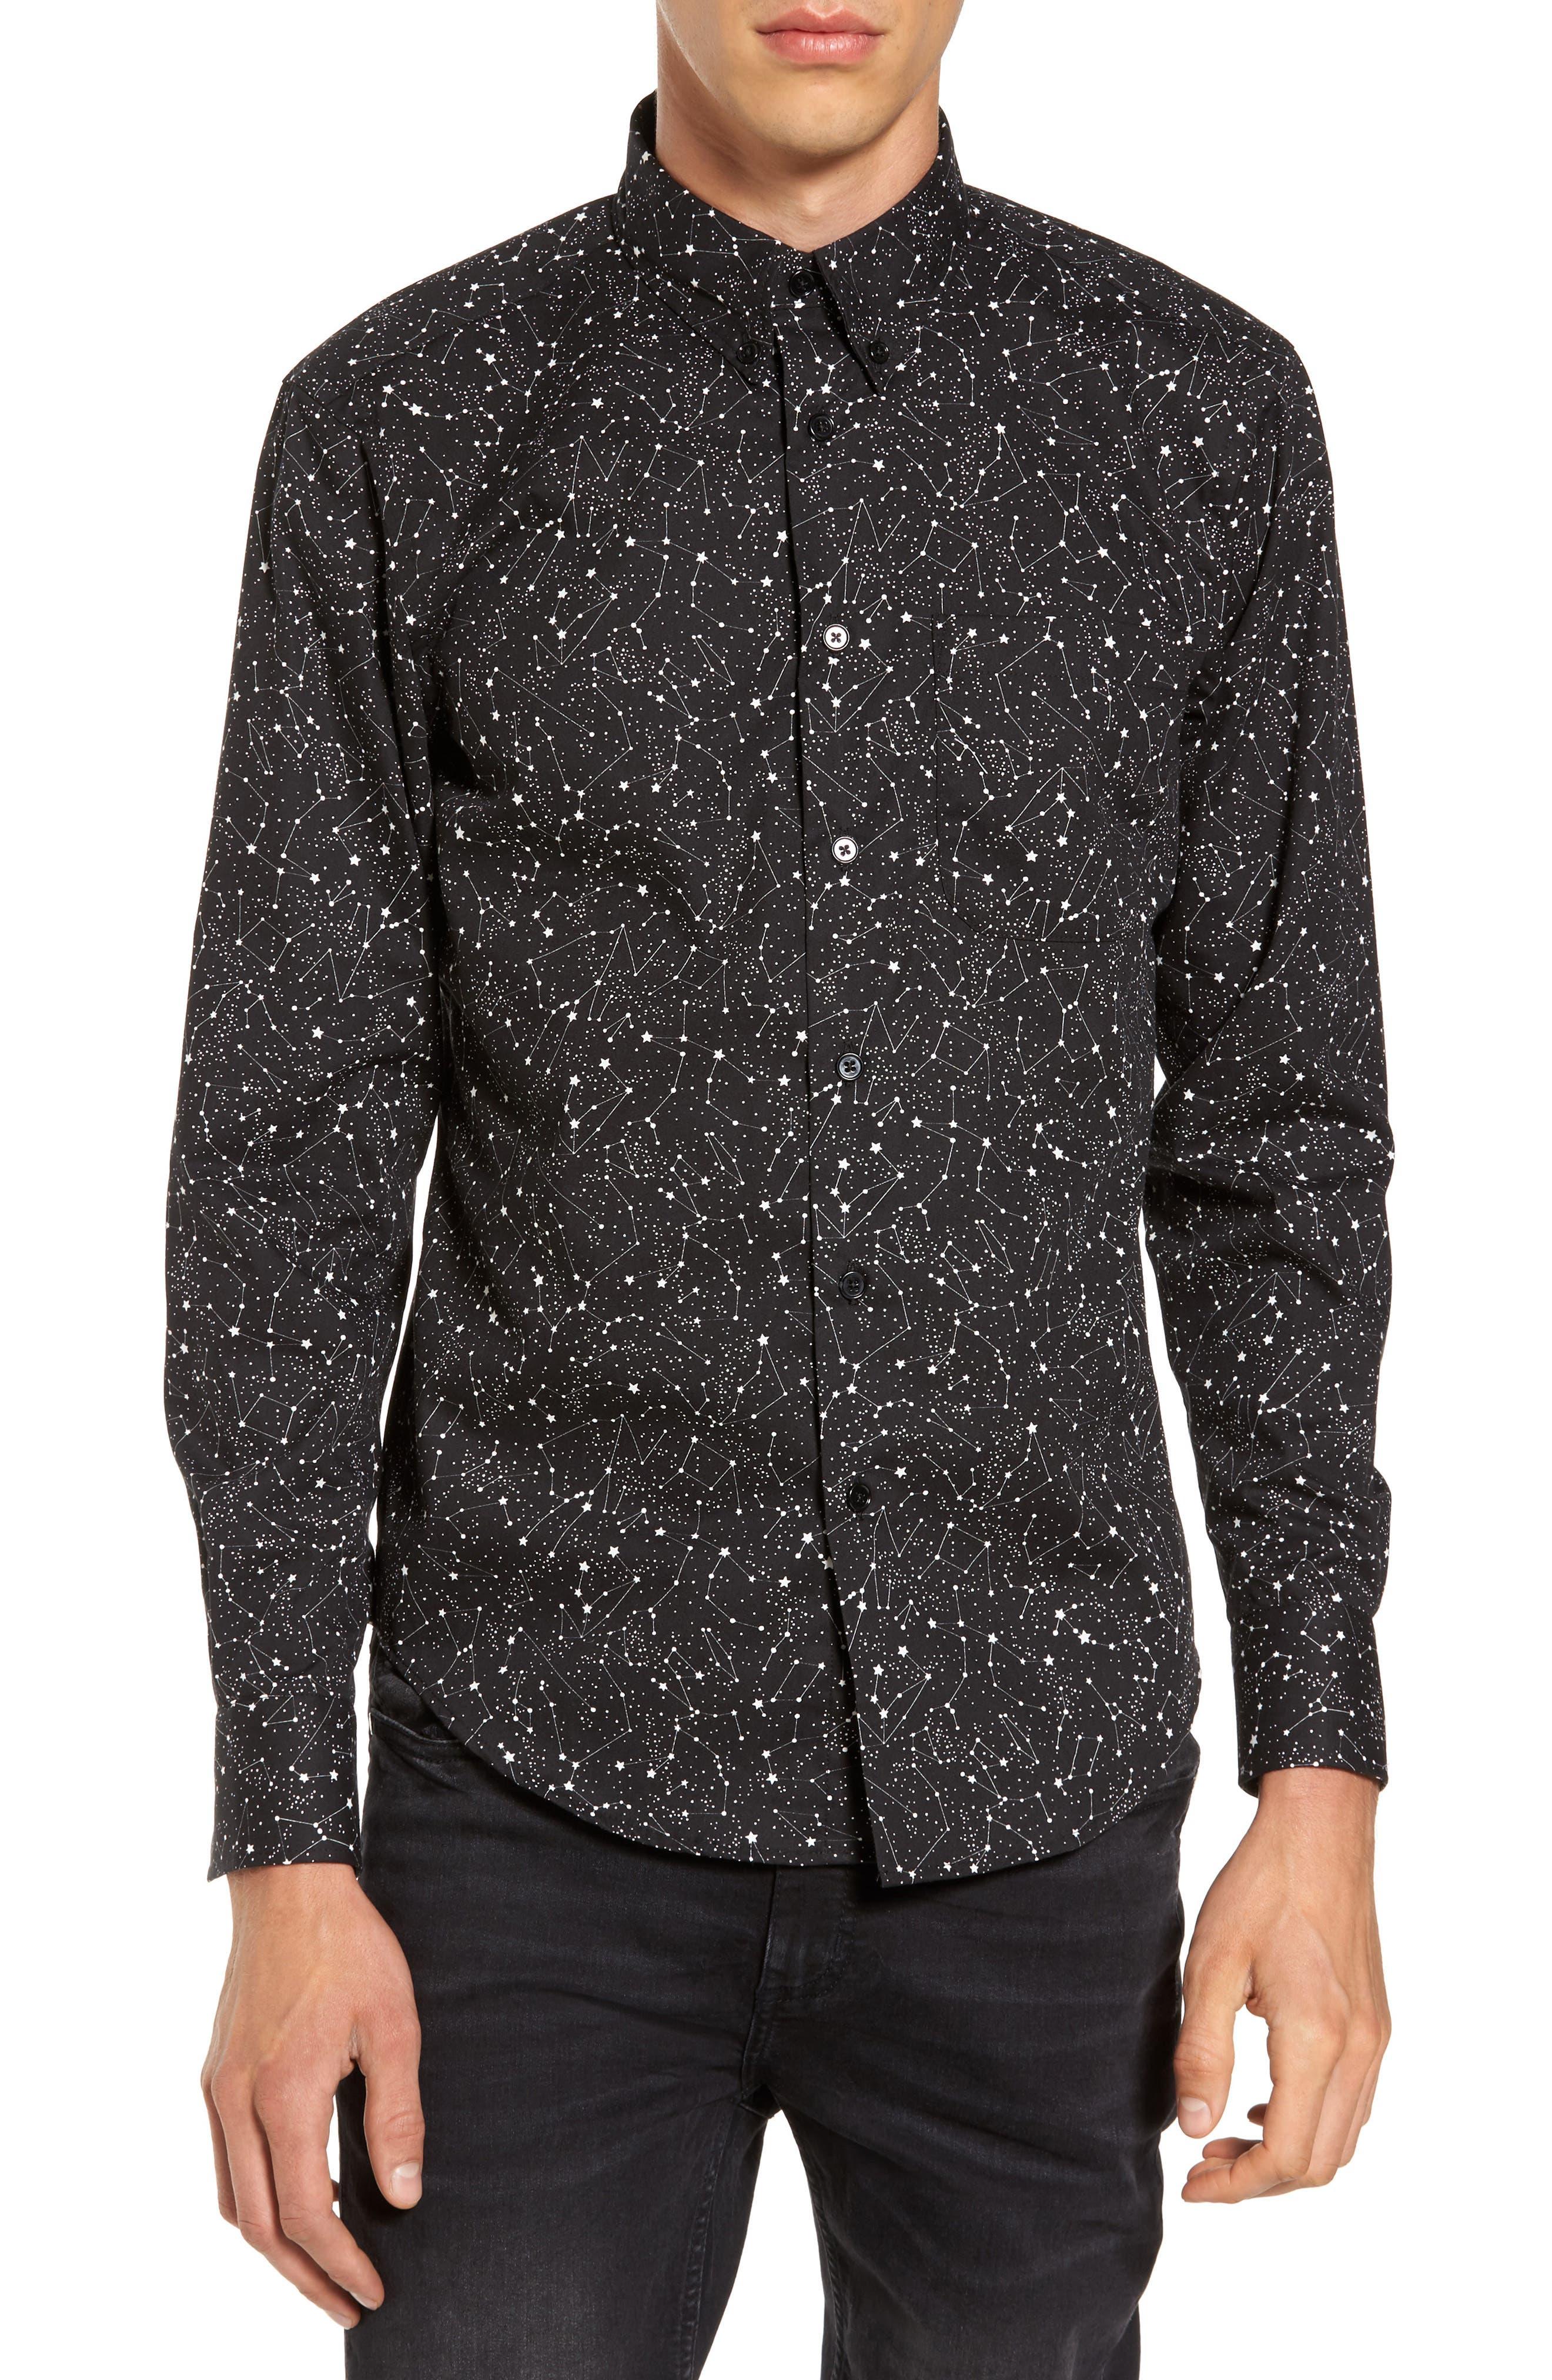 Constellations Shirt,                         Main,                         color, Black